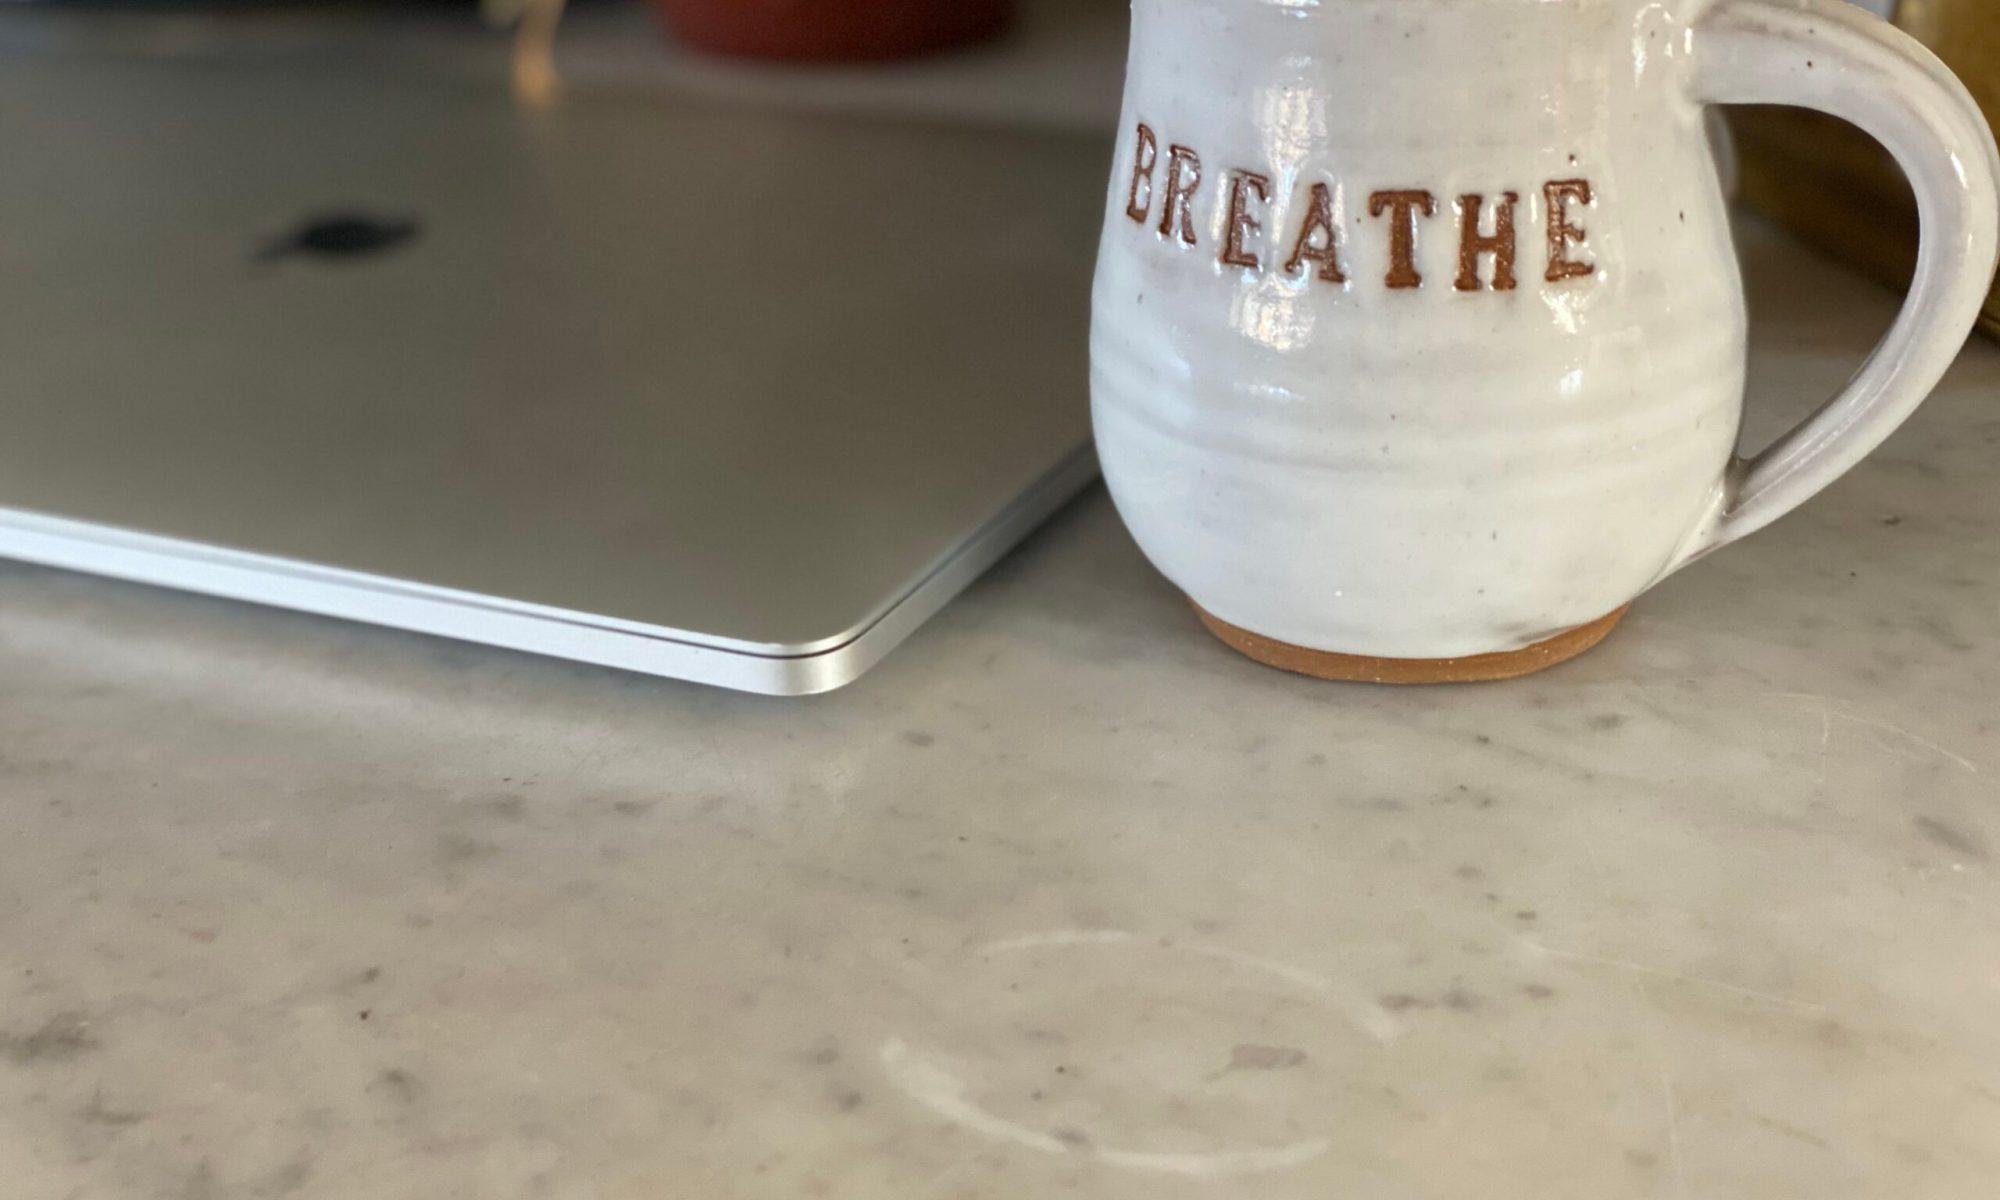 Computer & Breathe coffee mug